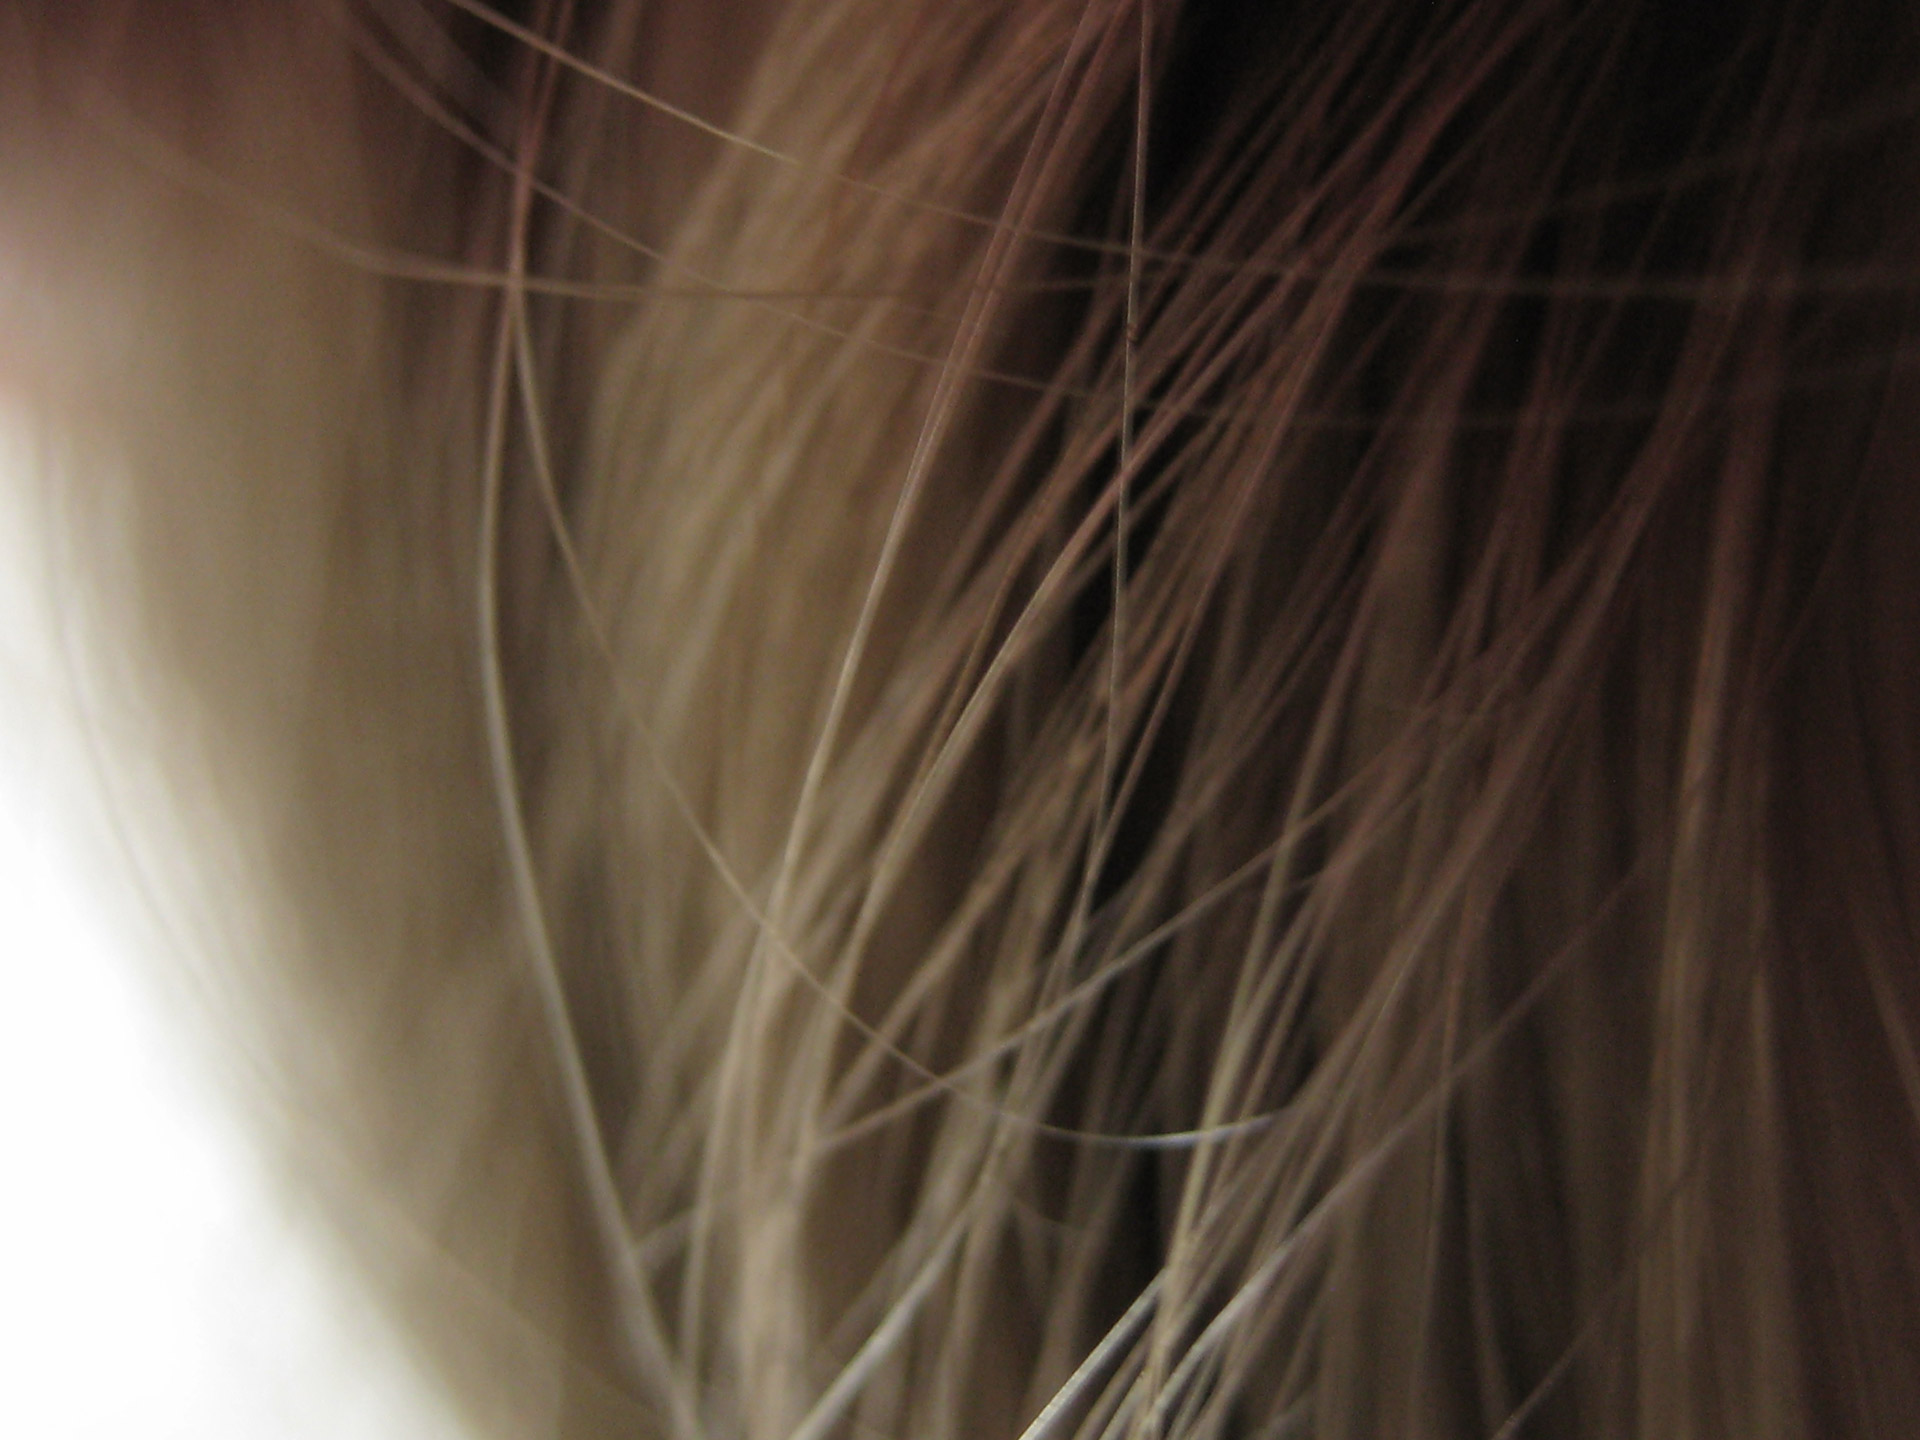 Light Long Hair Texture Free Stock Photo Public Domain